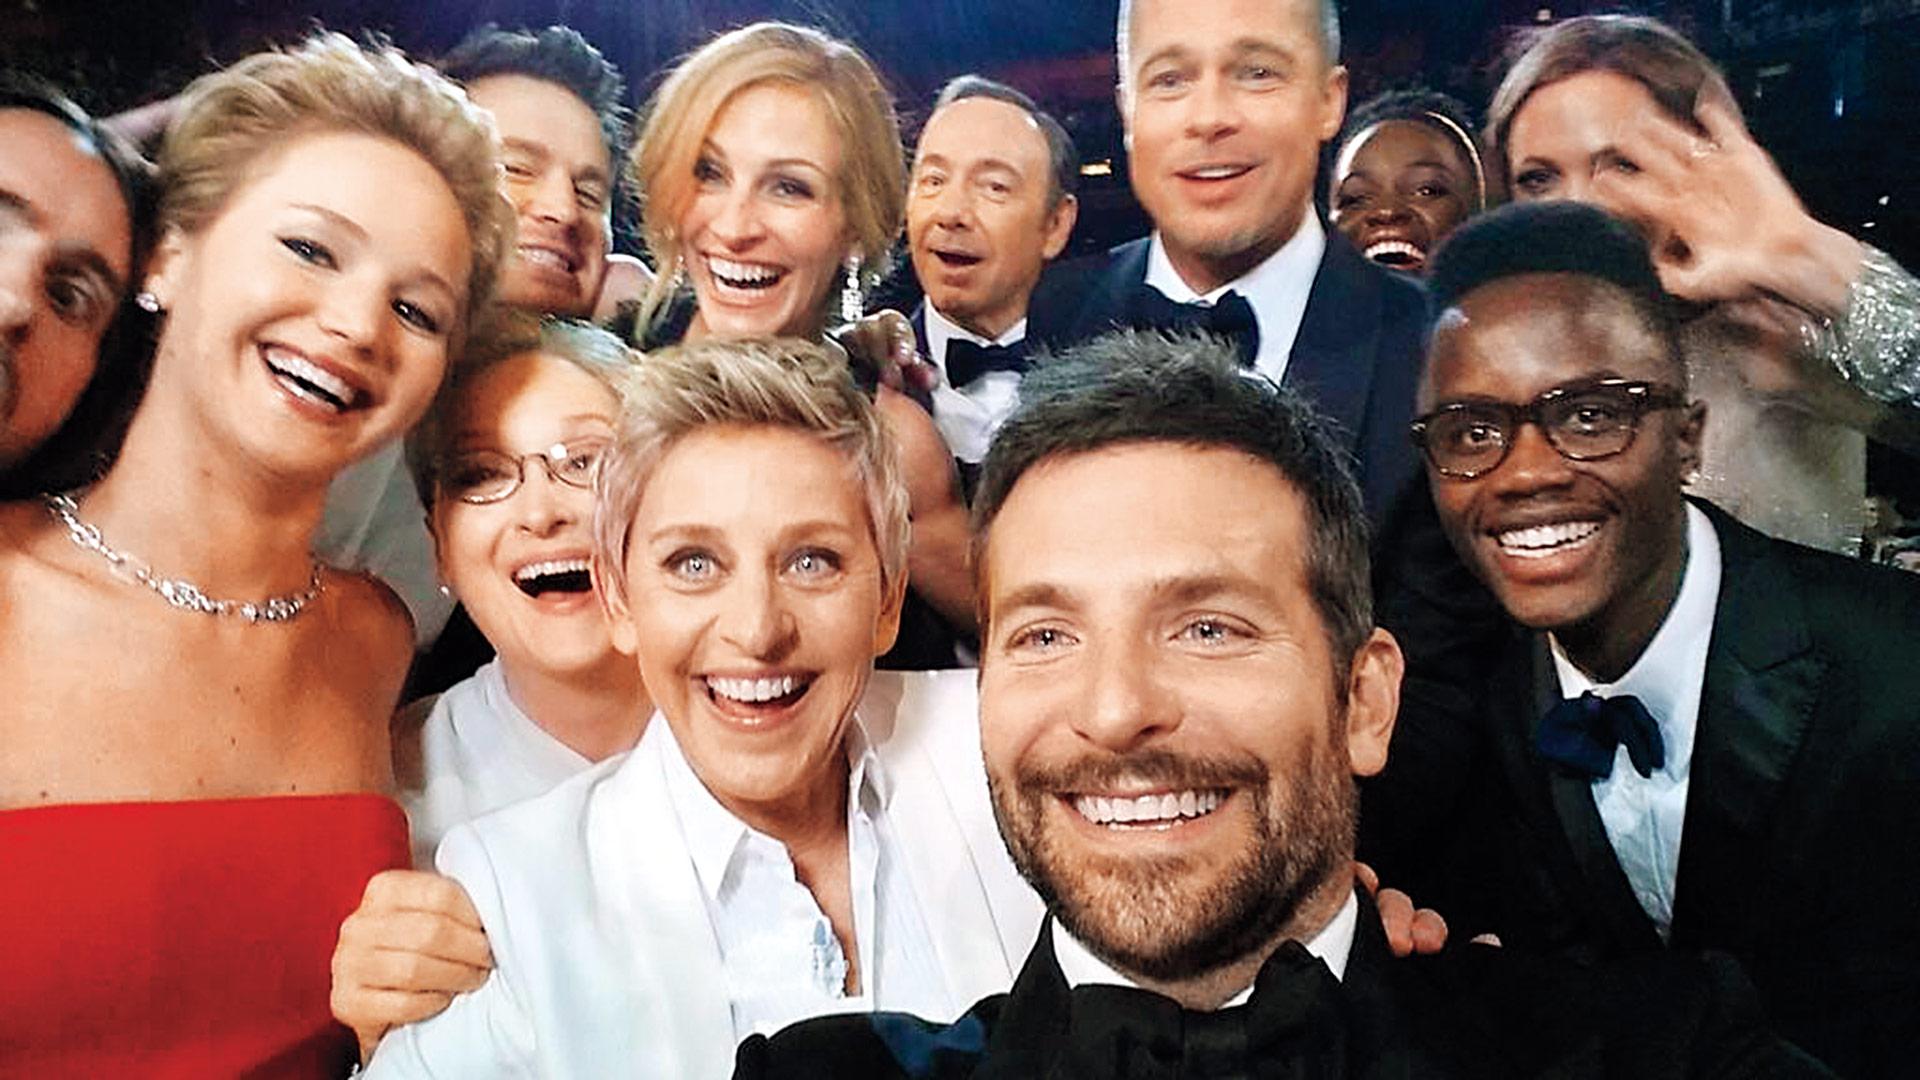 premios-oscar-2019-selfie